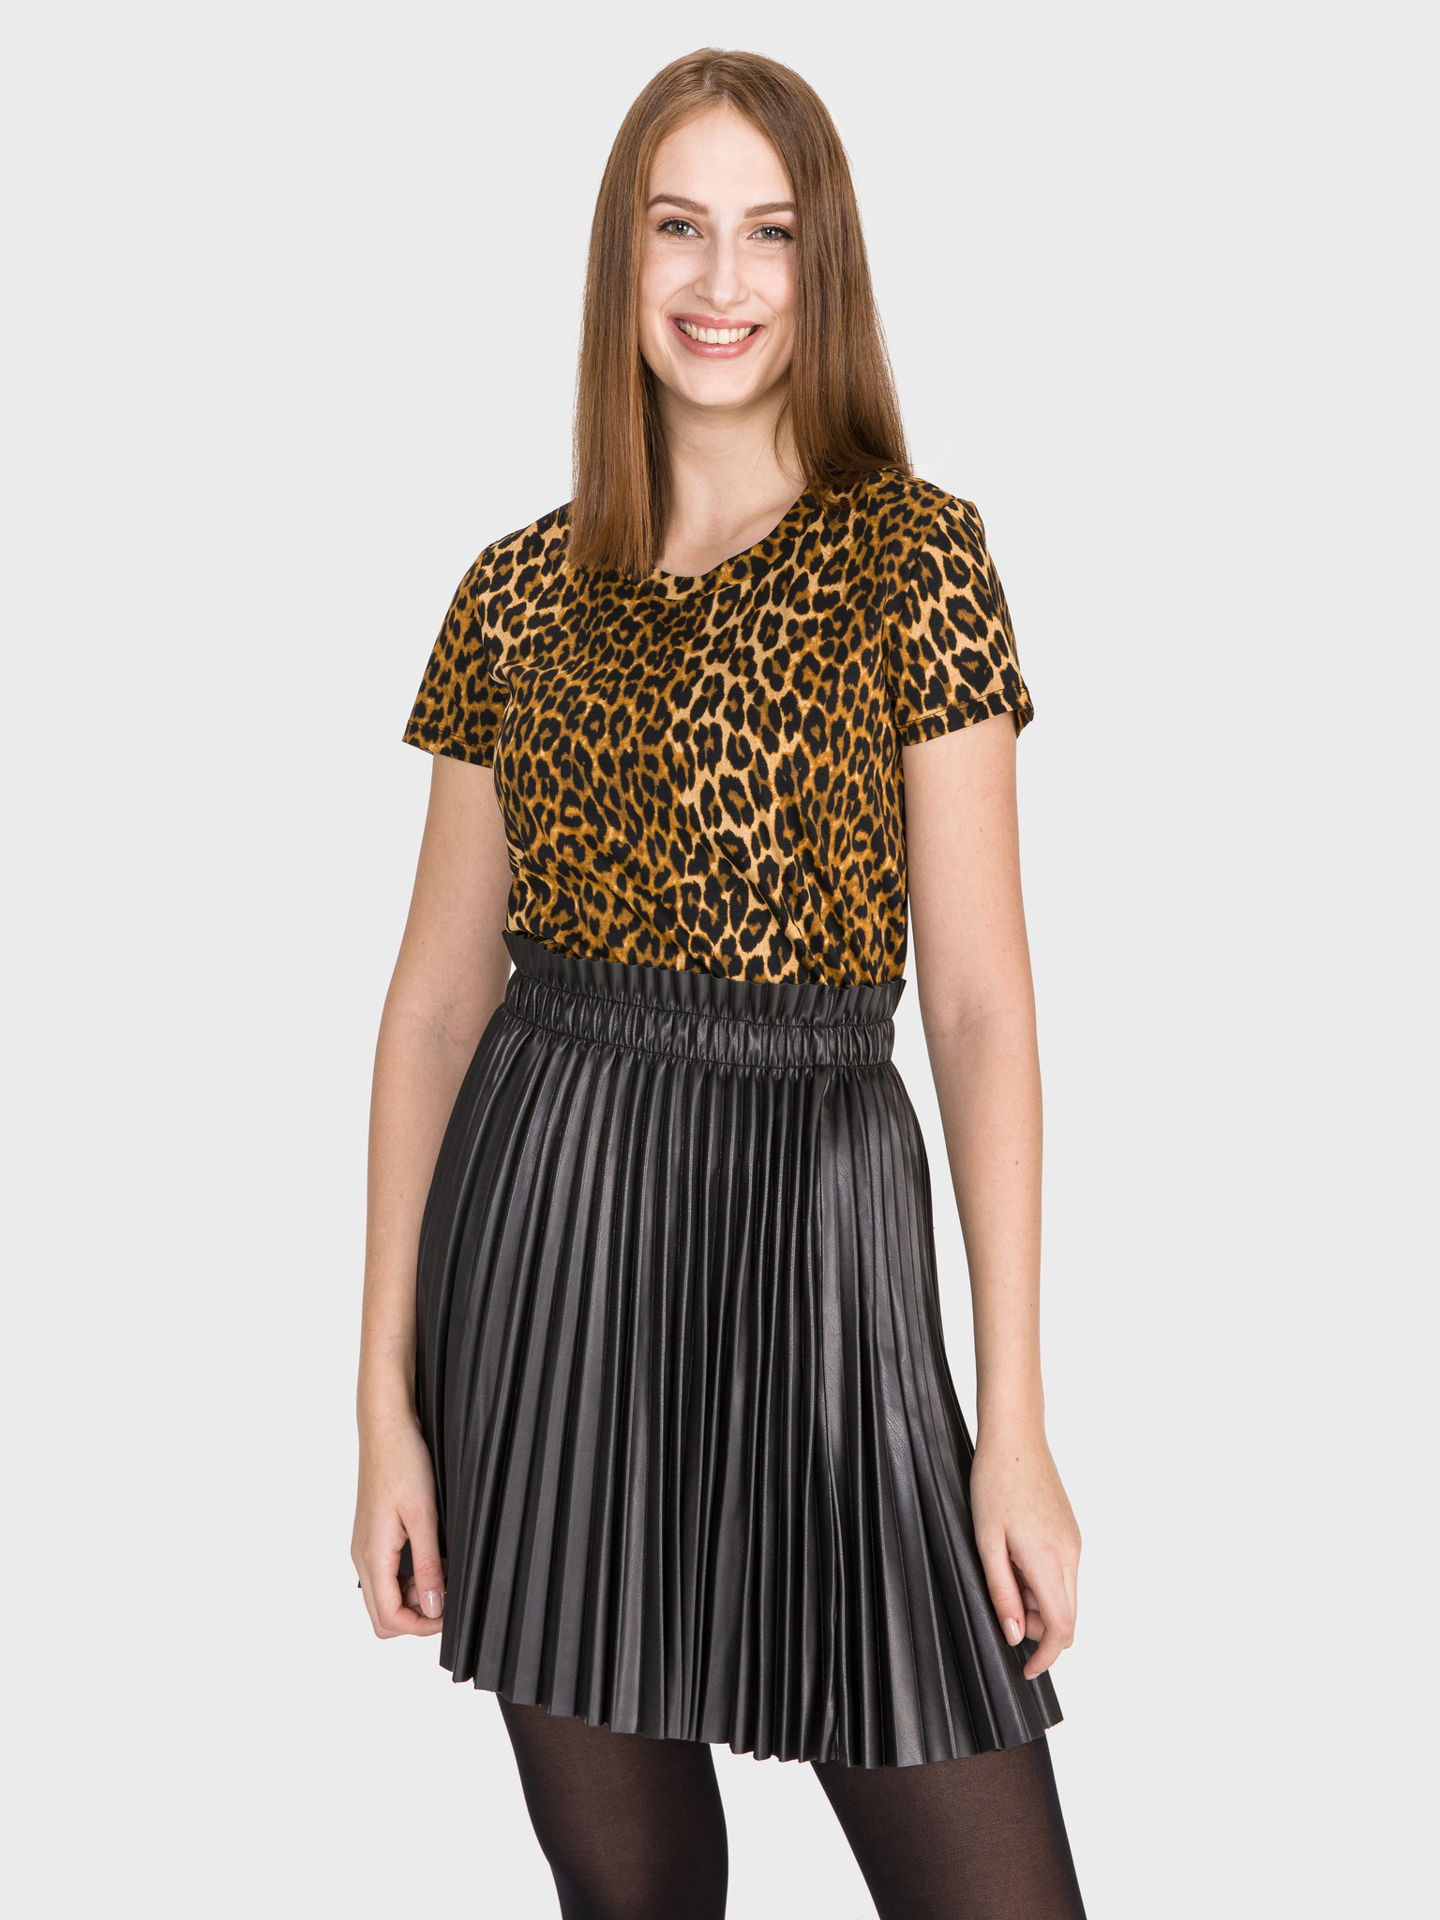 Tricouri pentru femei Scotch & Soda - galben, maro